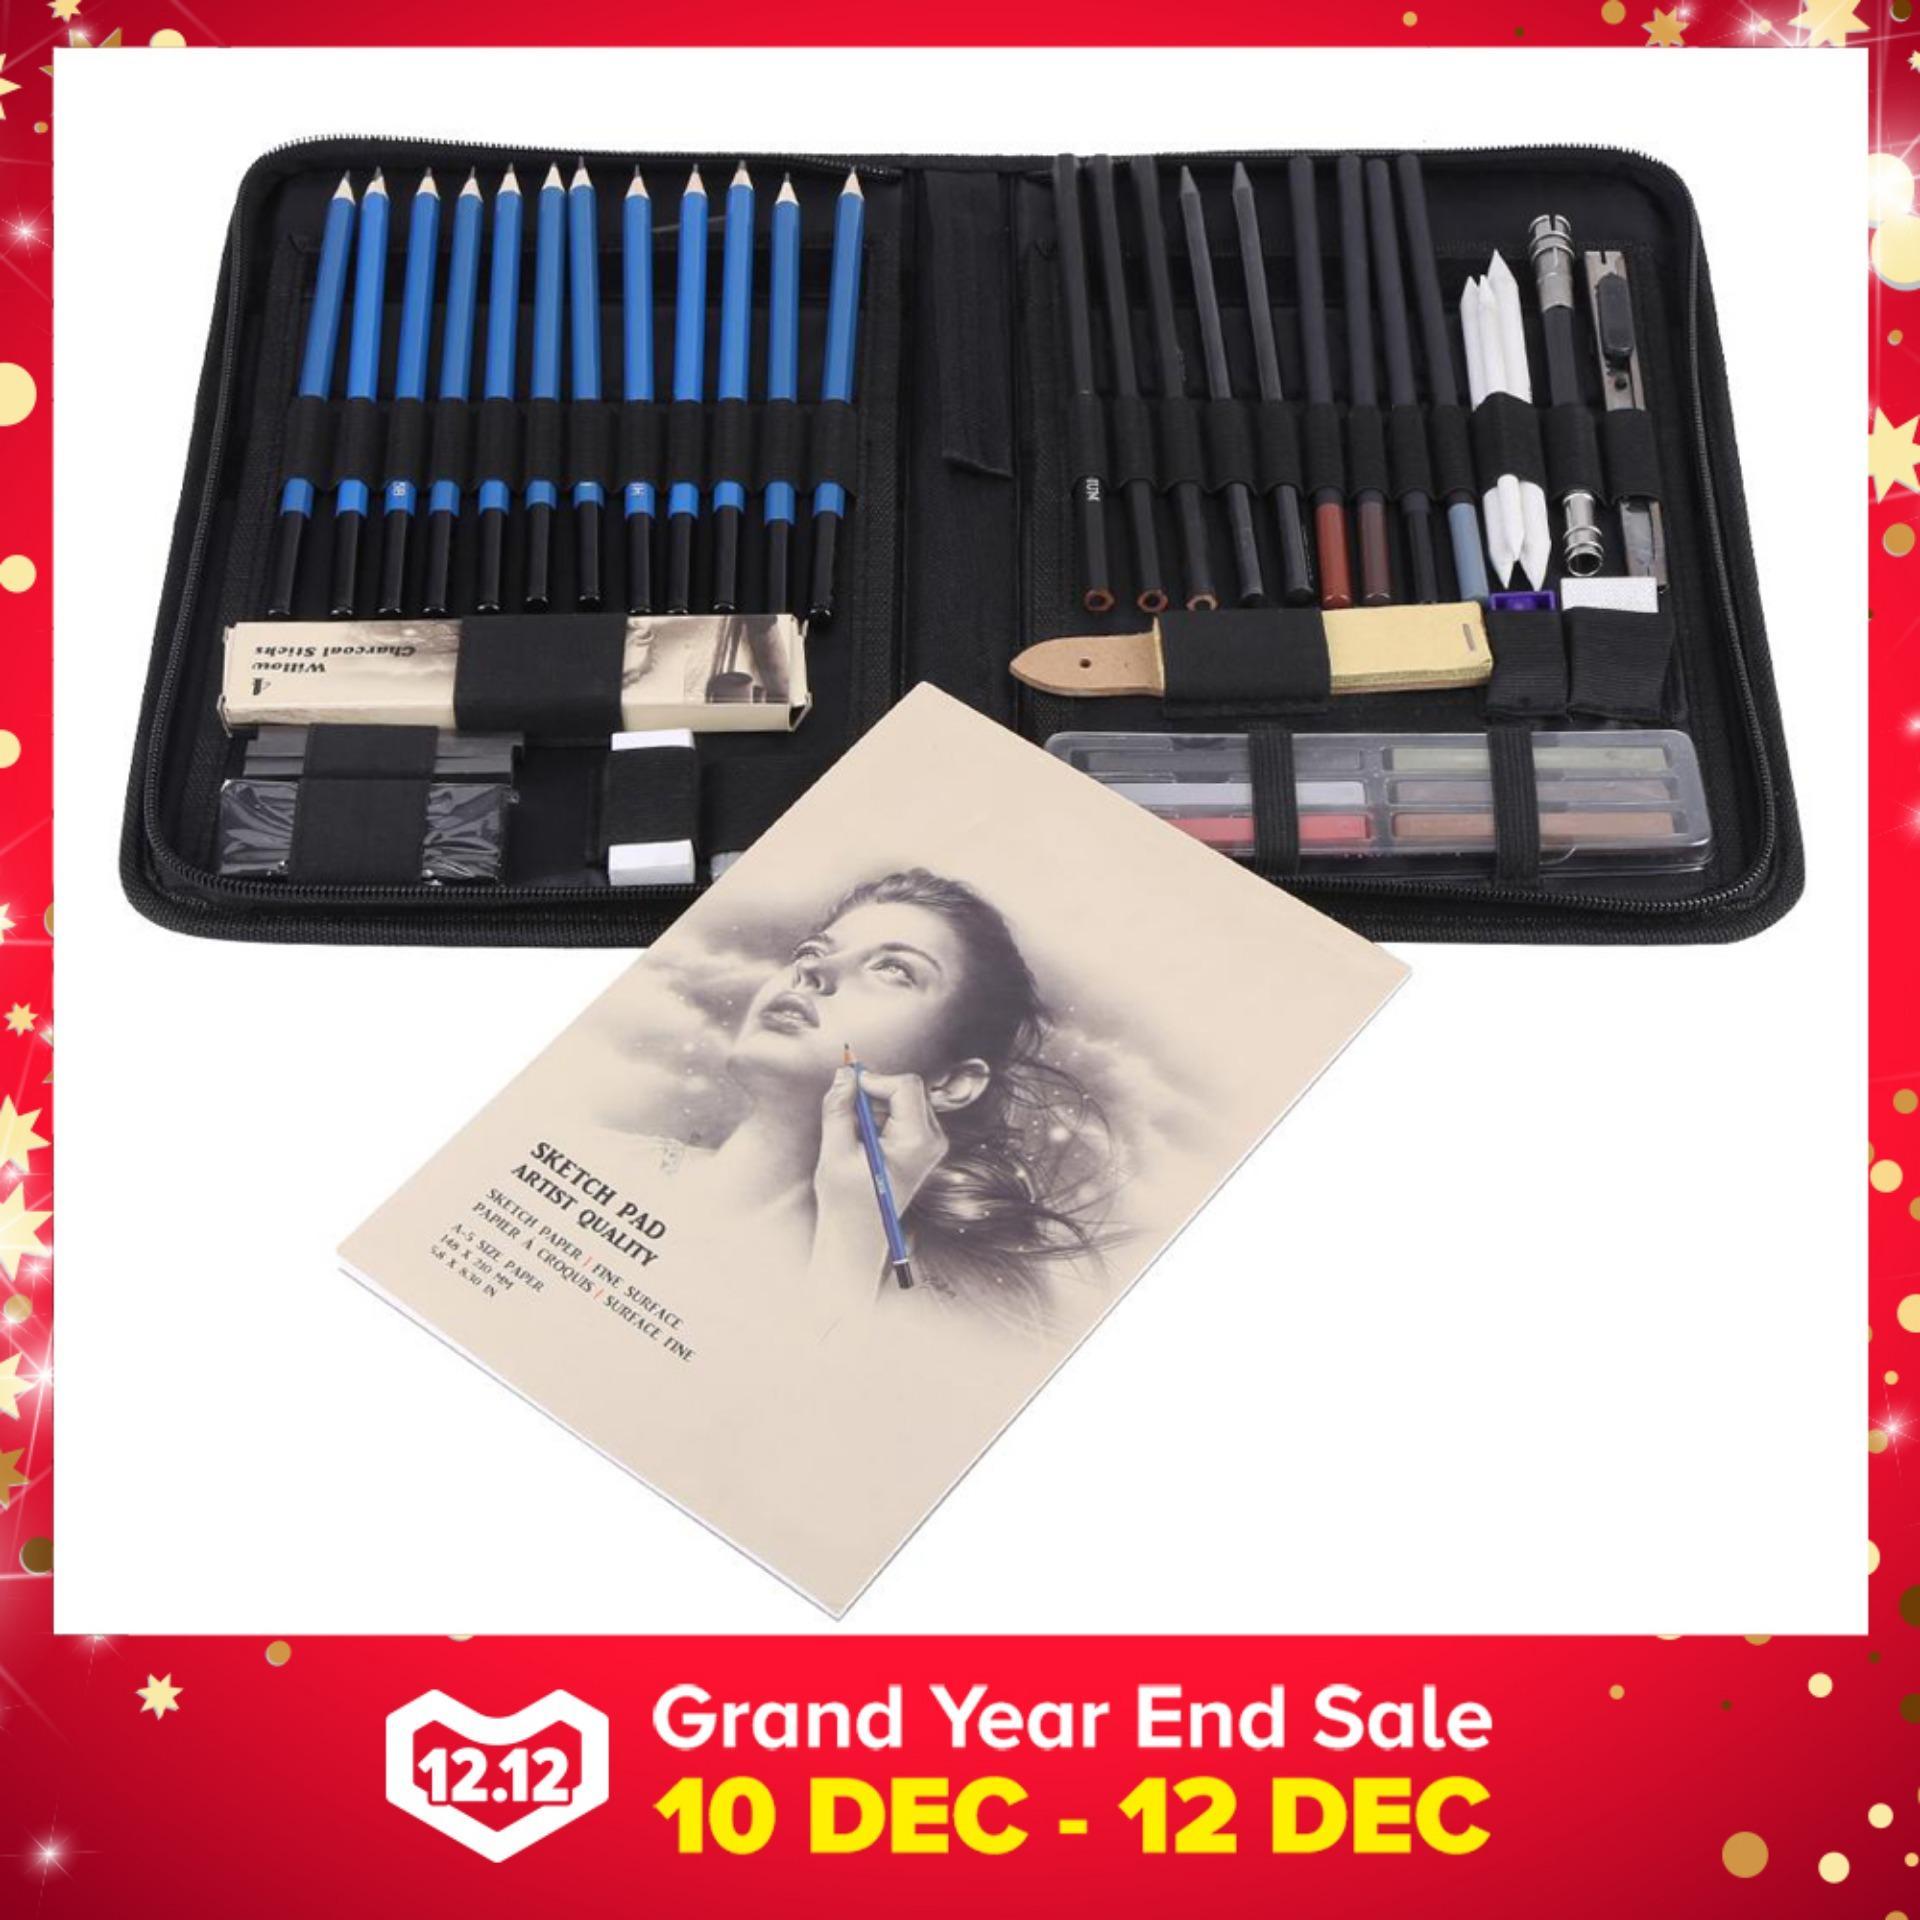 48PCS Professional Sketching Drawing Pencils Kit Carry Bag Art Painting Tool Set Student Black - intl